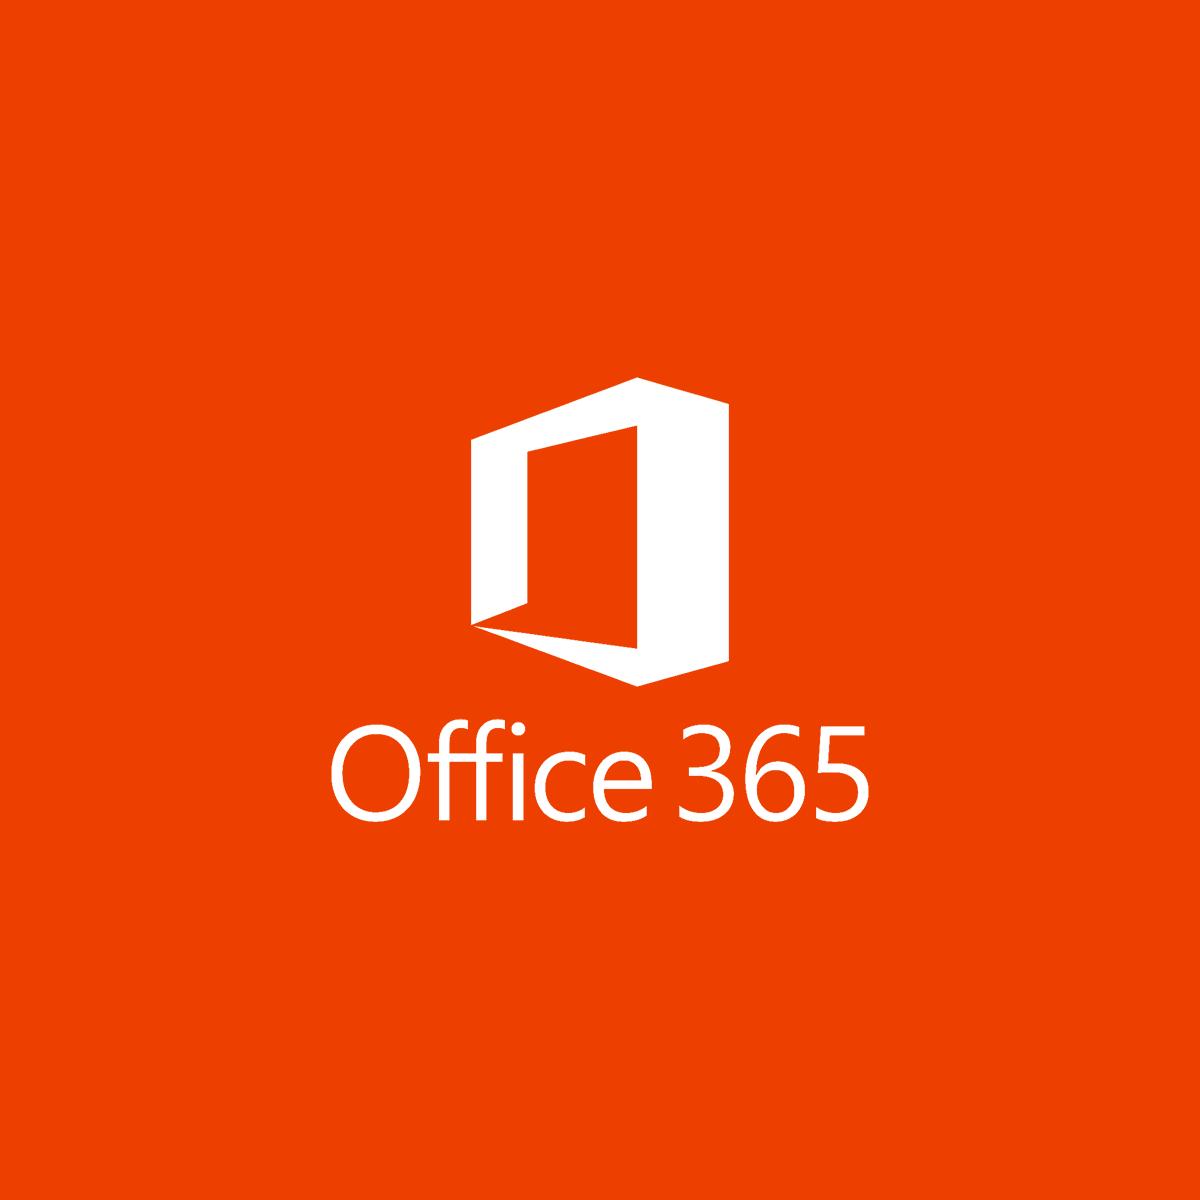 Microsoft Office 365 Logo